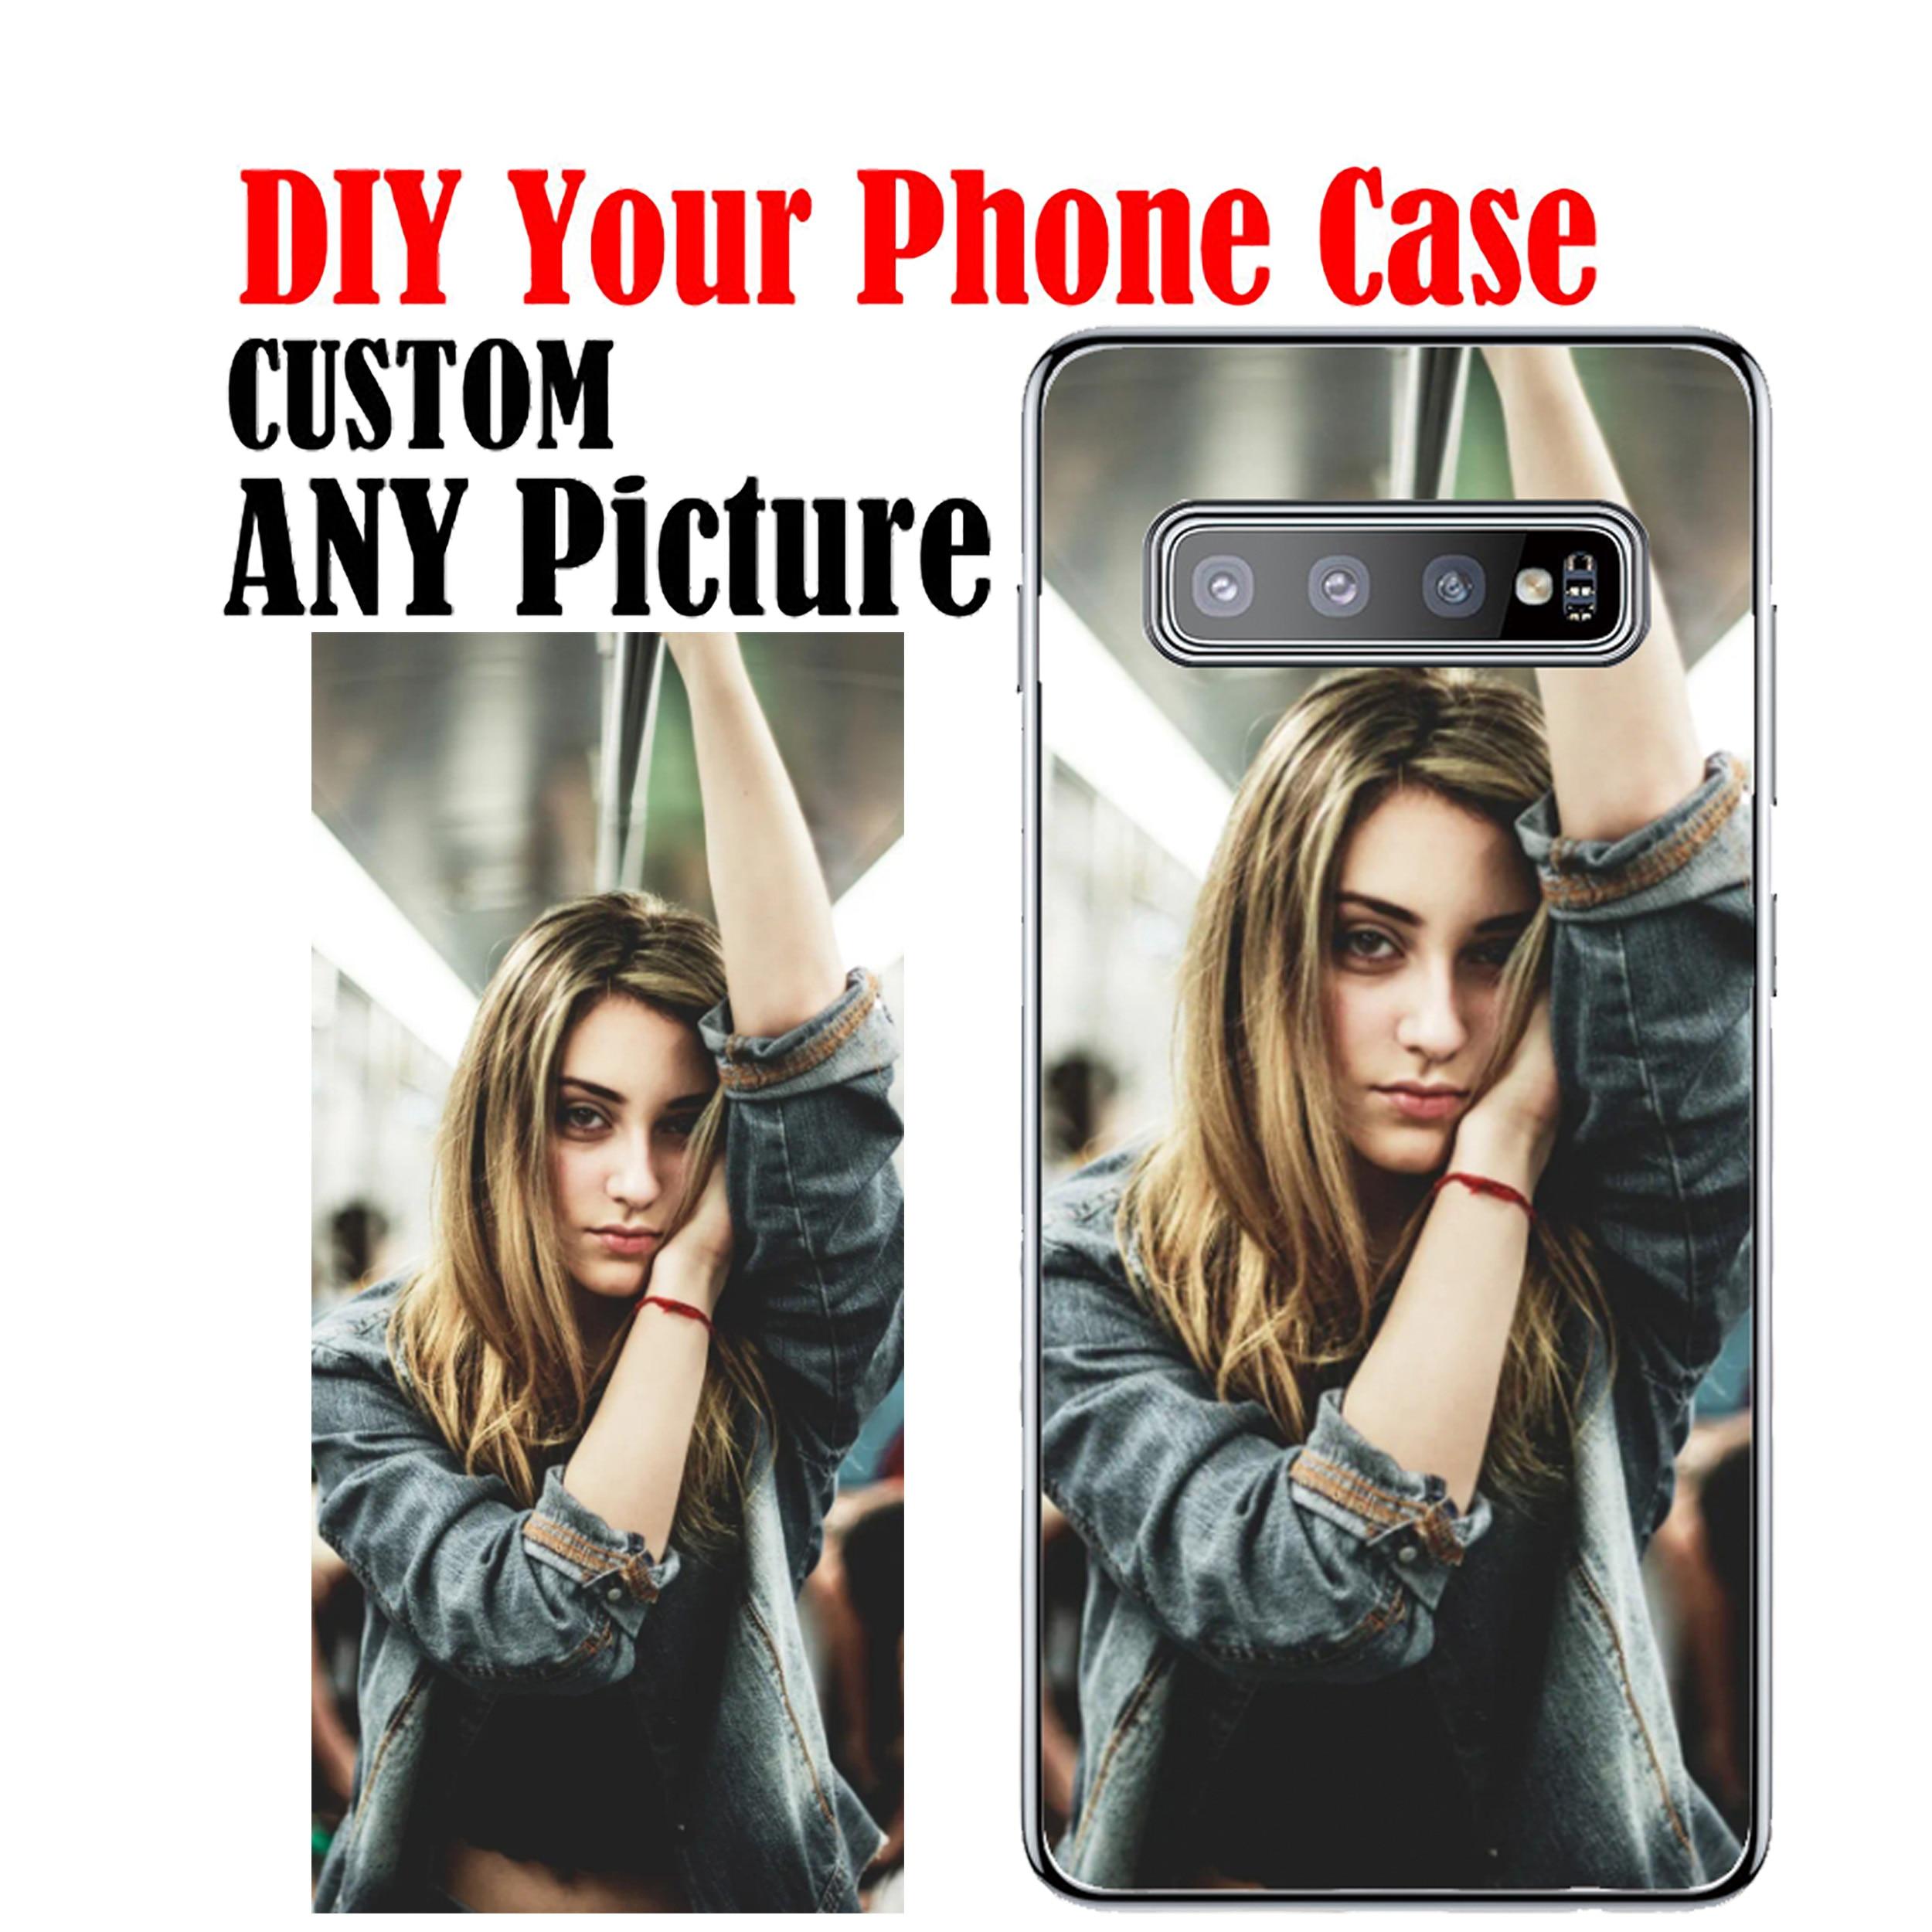 Funda de silicona personalizada Coque agregar su propia foto funda de teléfono para Samsung S20 Ultra S11 S10E S20 S11 S10 S9 S8P